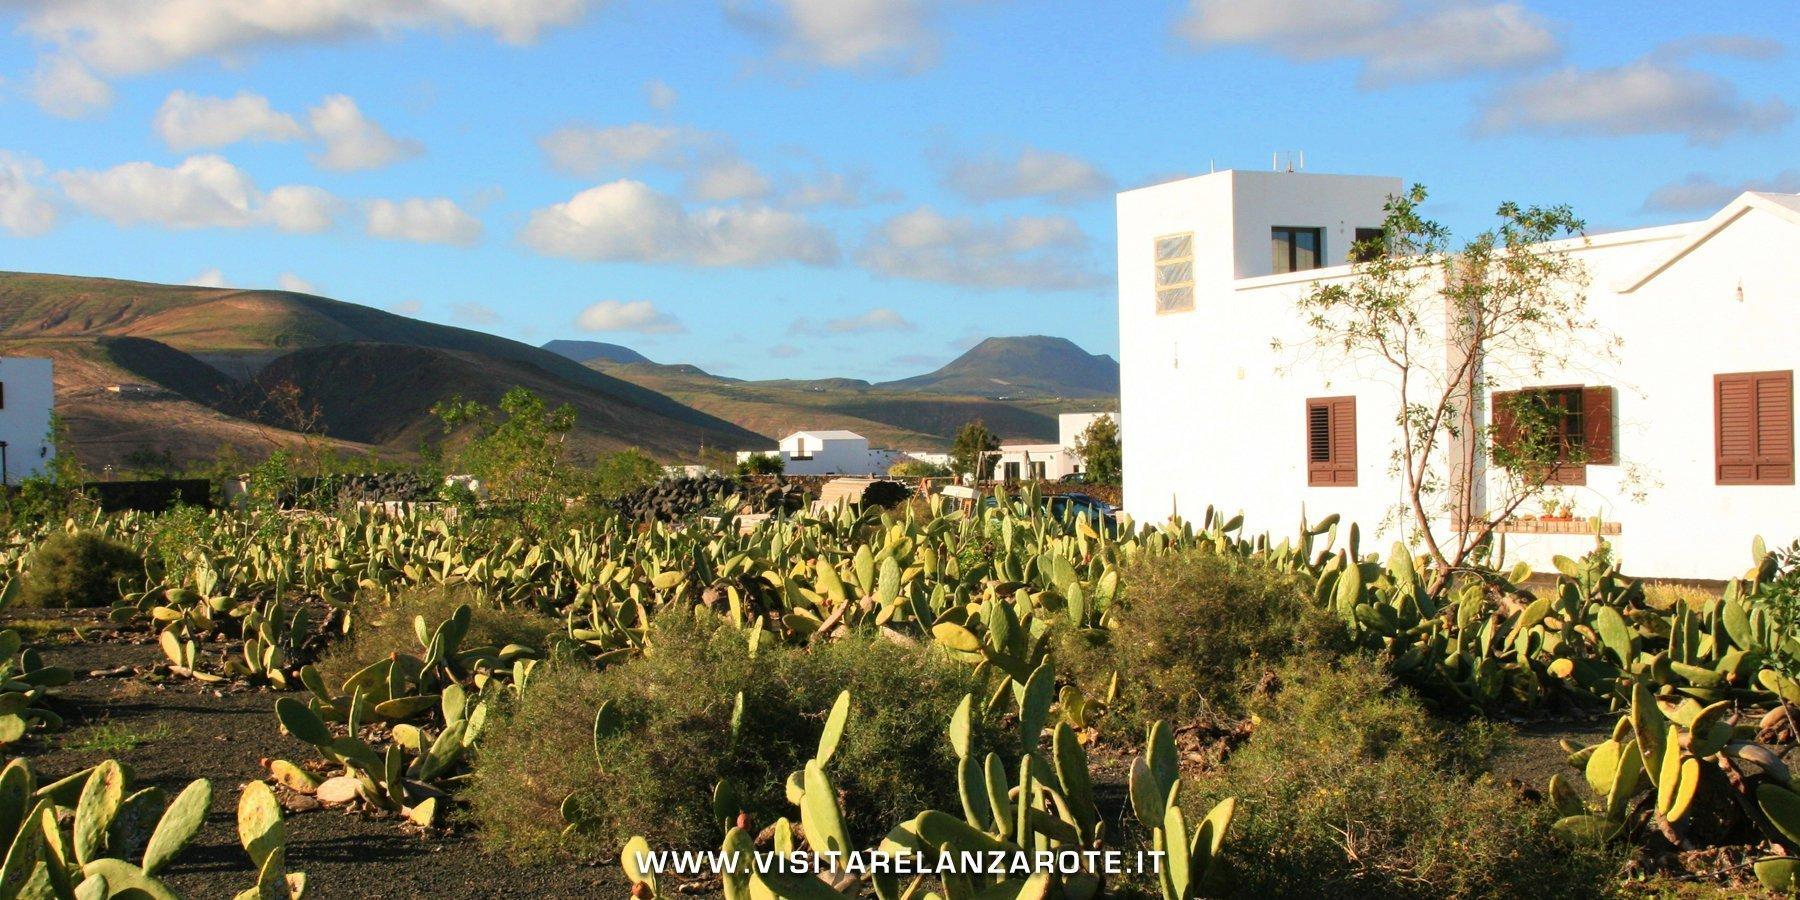 Mala Lanzarote